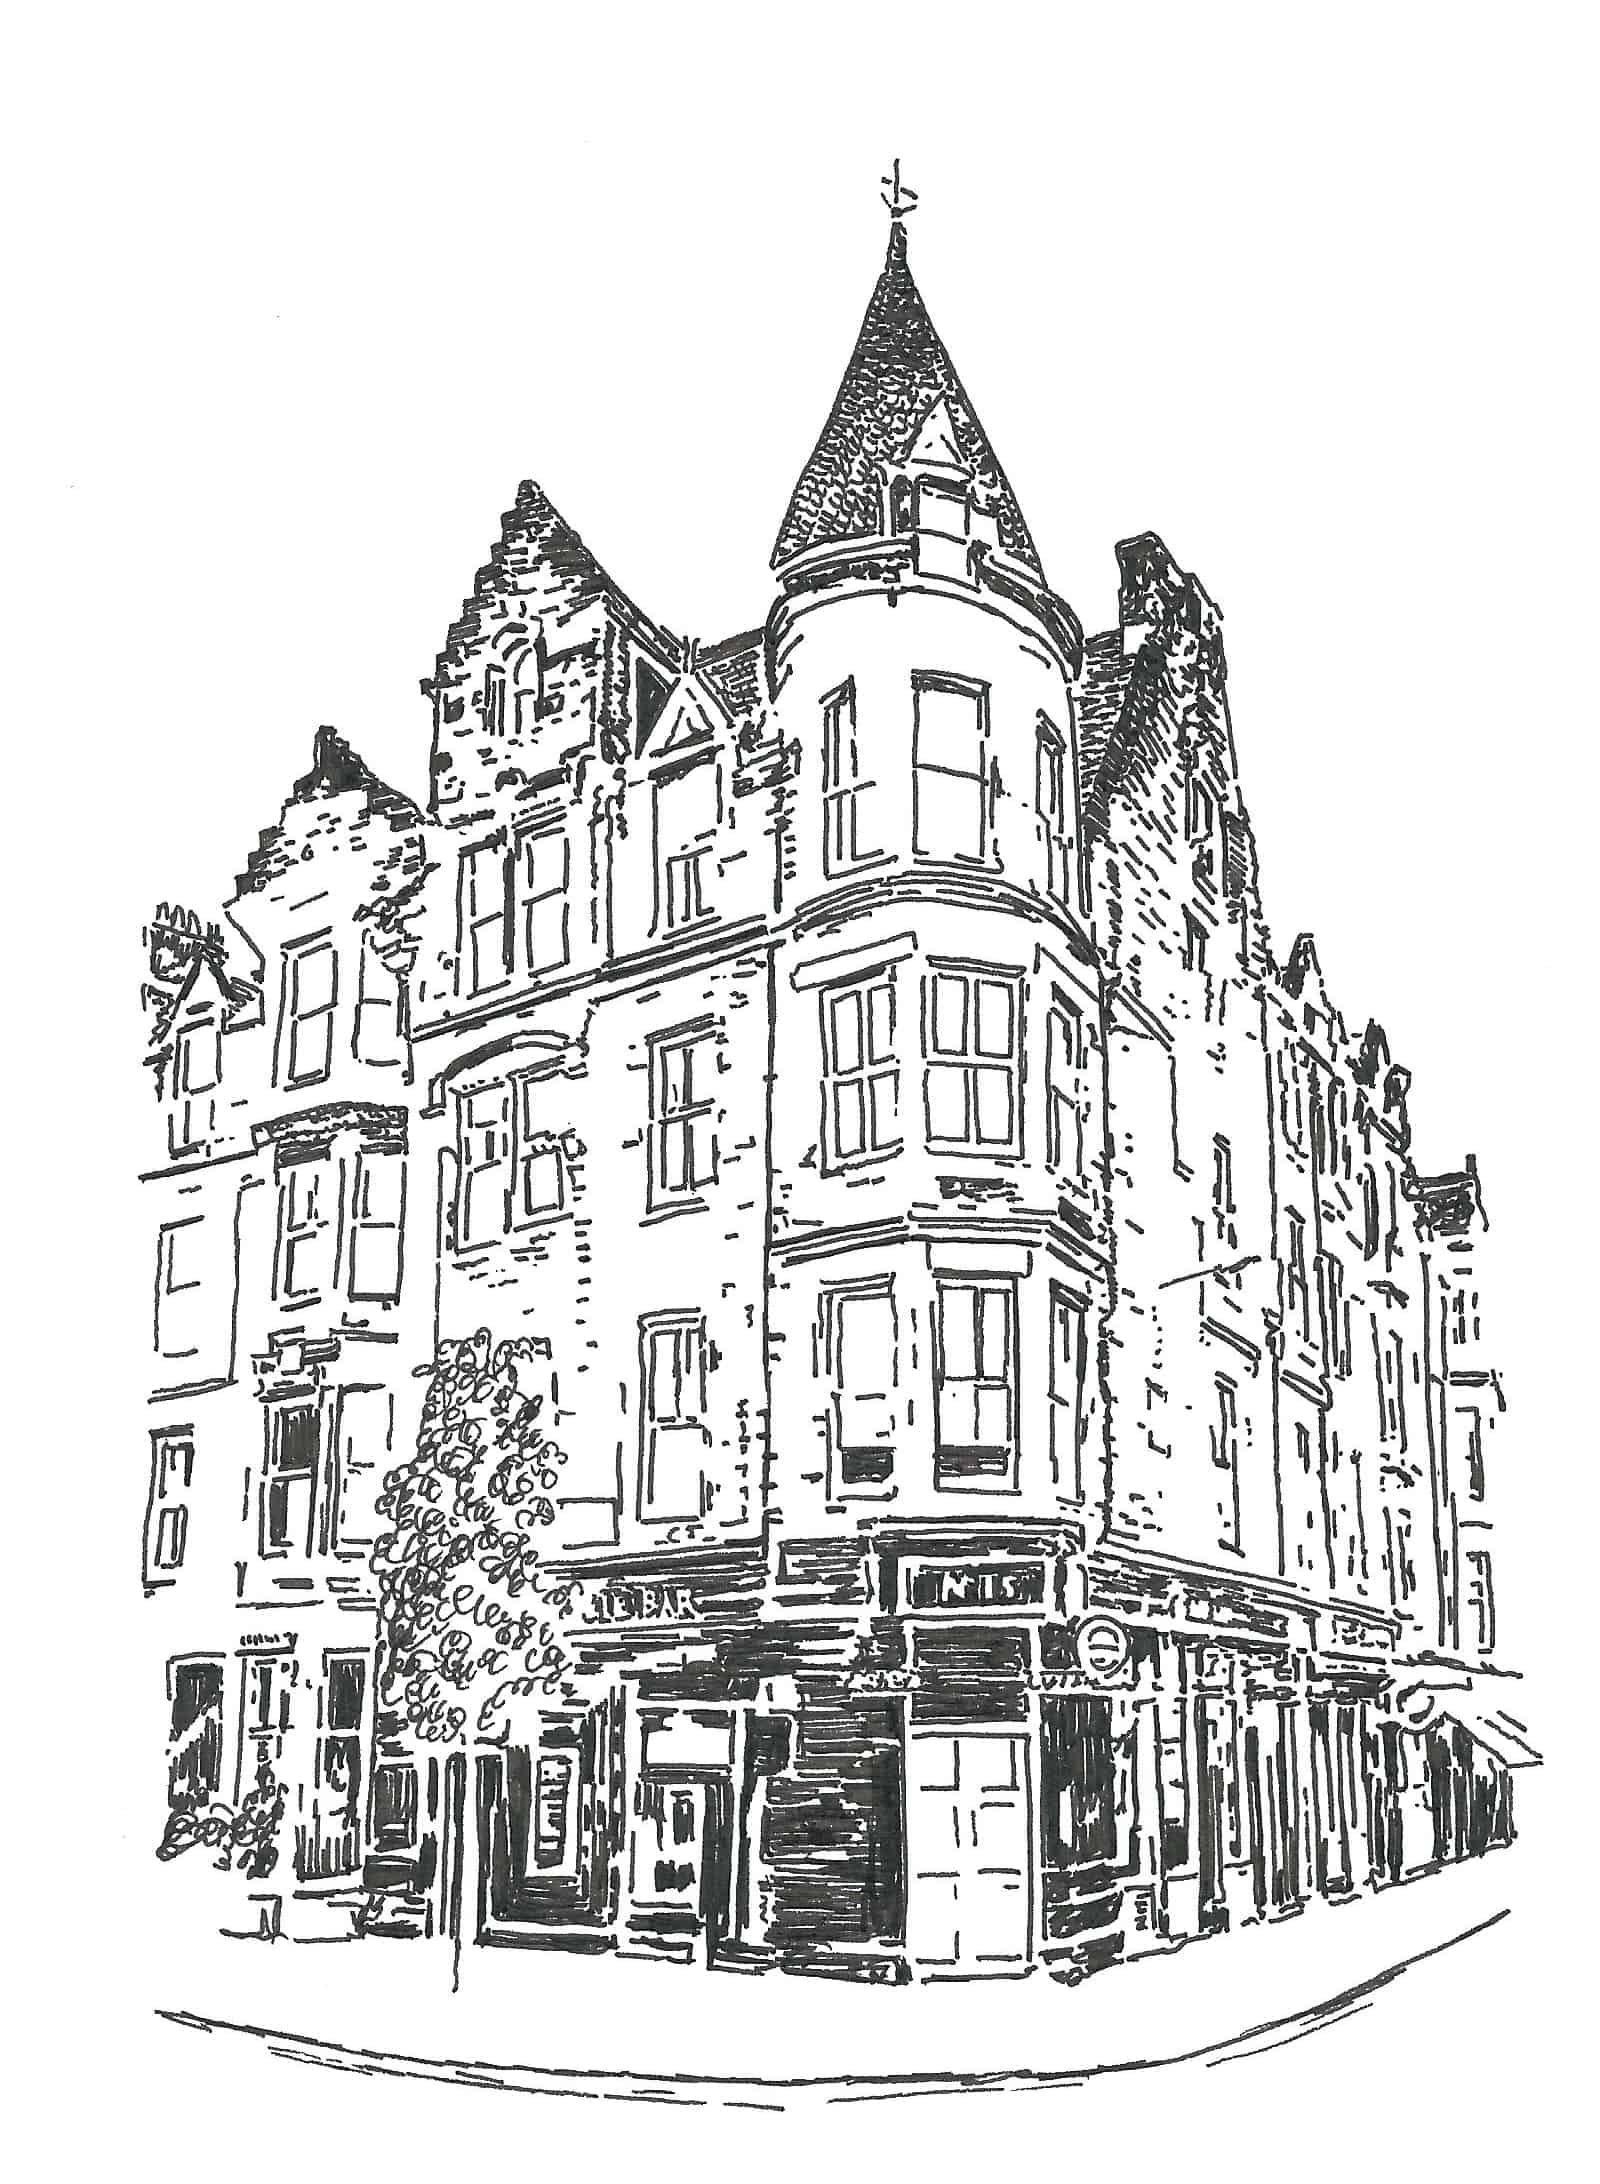 Personalised House Illustration